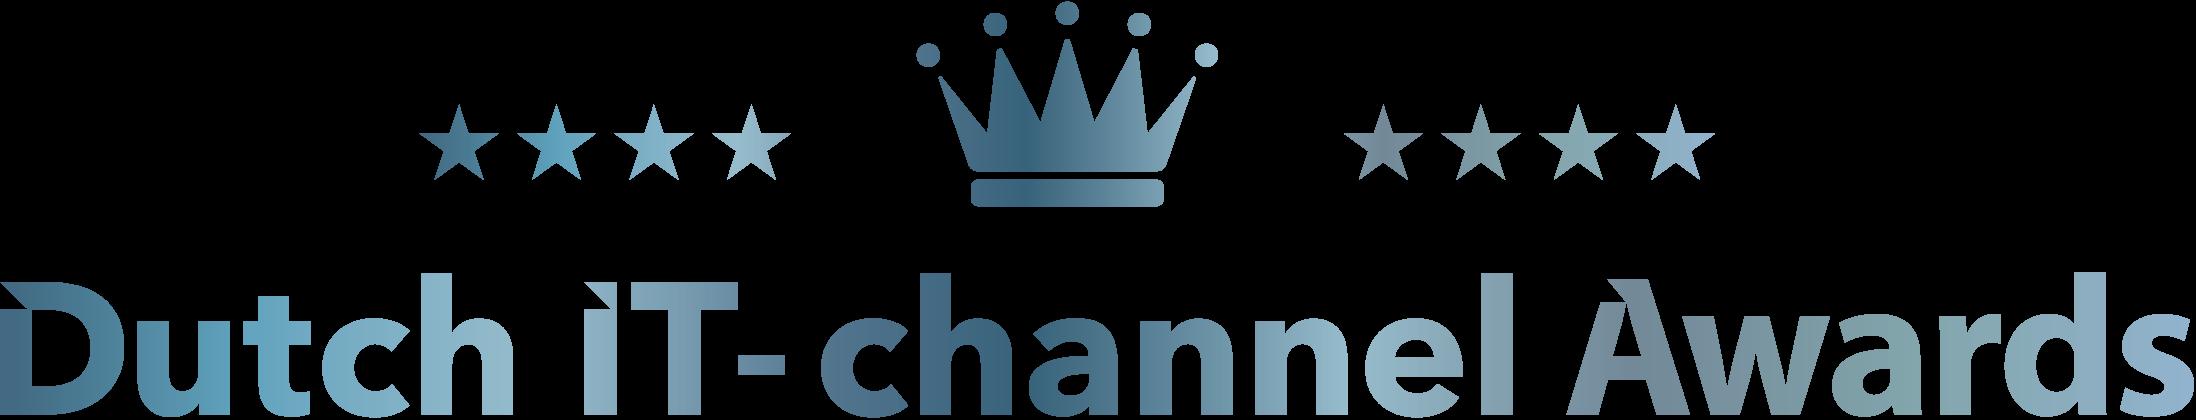 Dutch IT Channel Awards